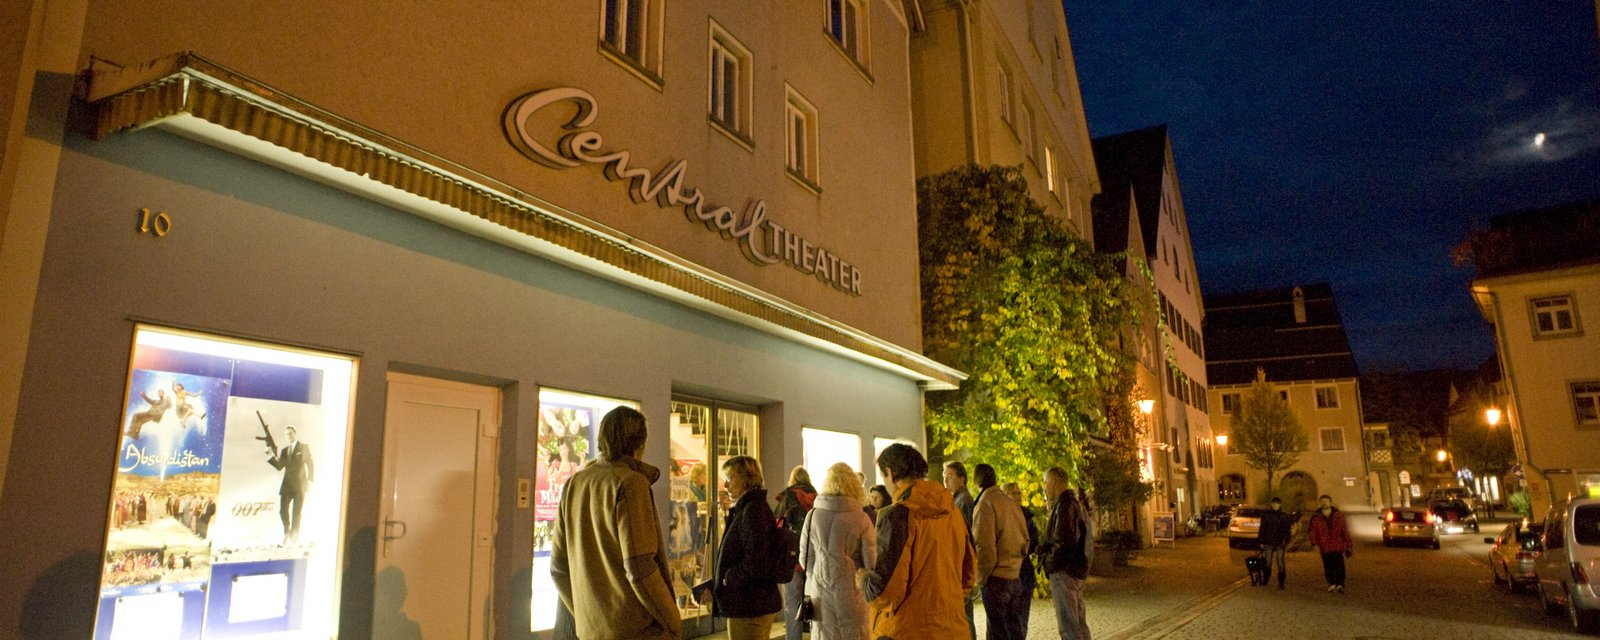 Kino Centraltheater